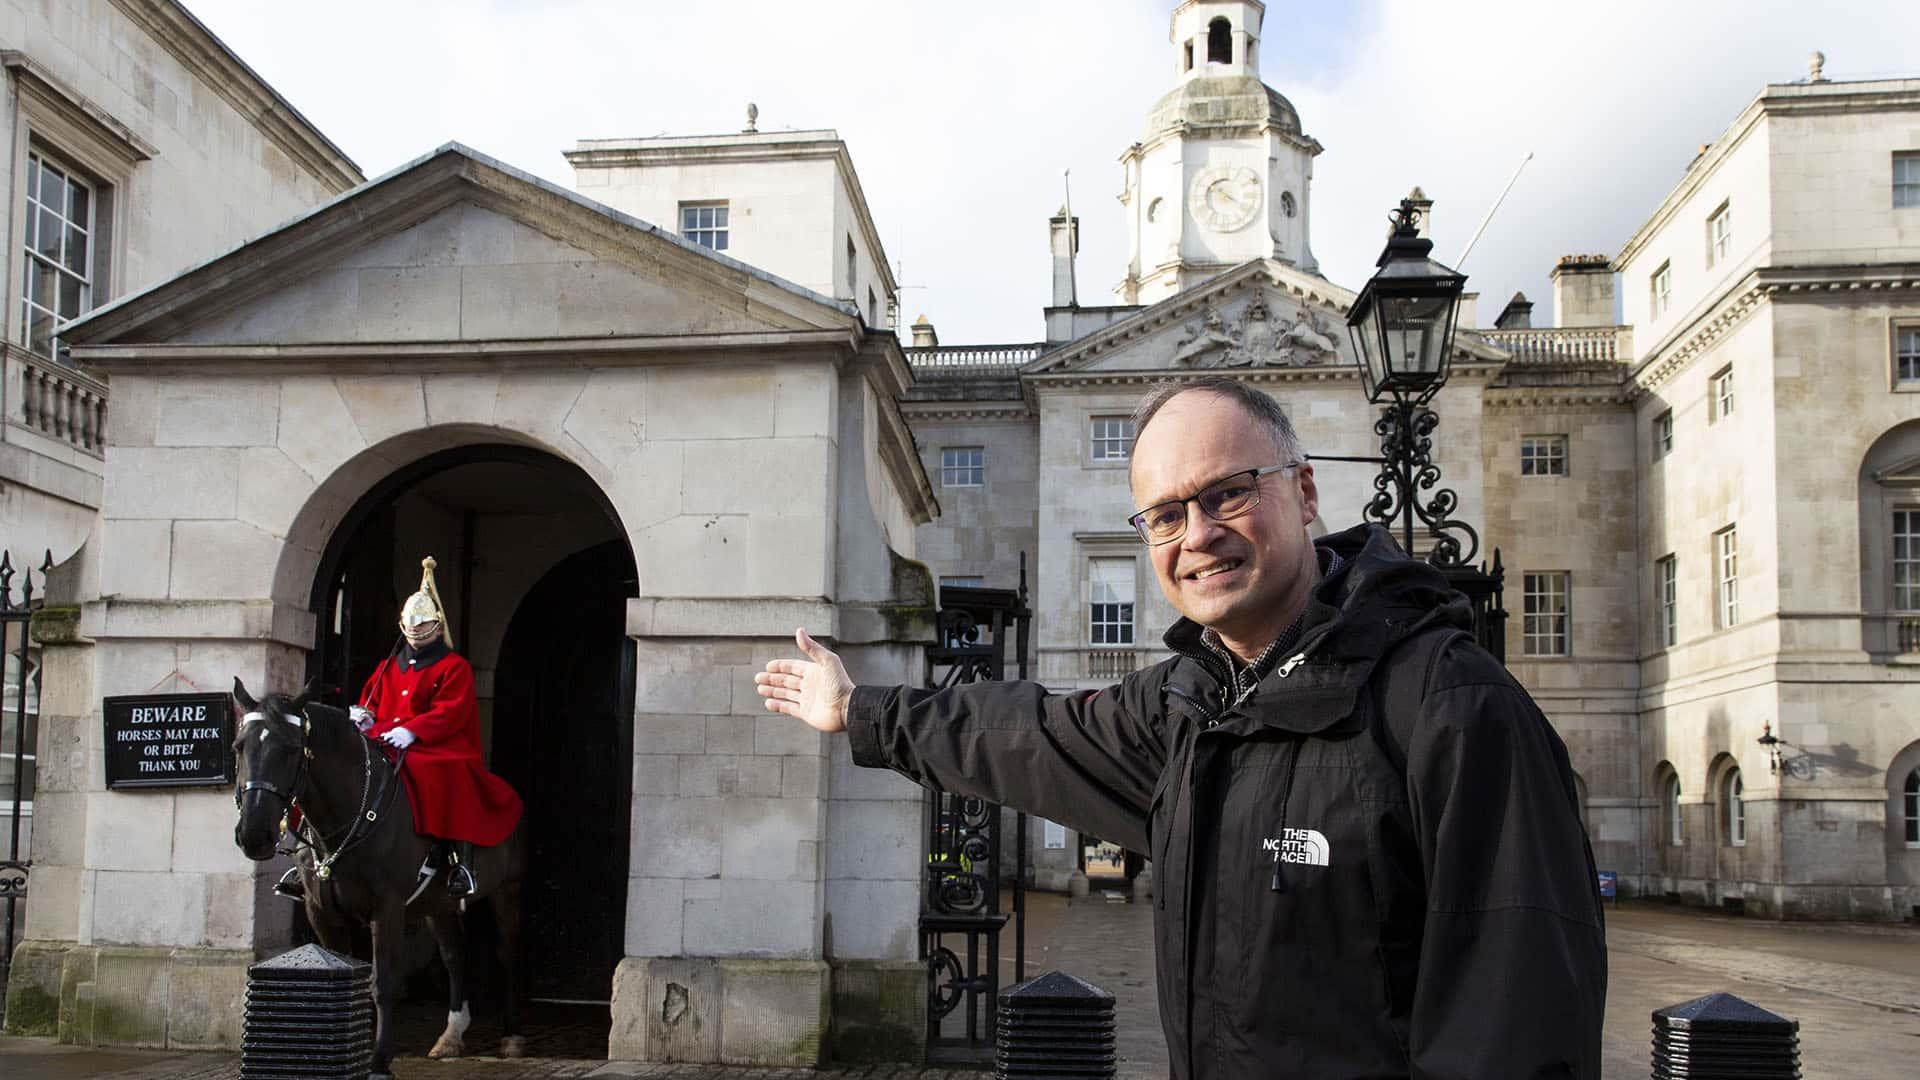 Guard on Horseback – The Crown London Tour